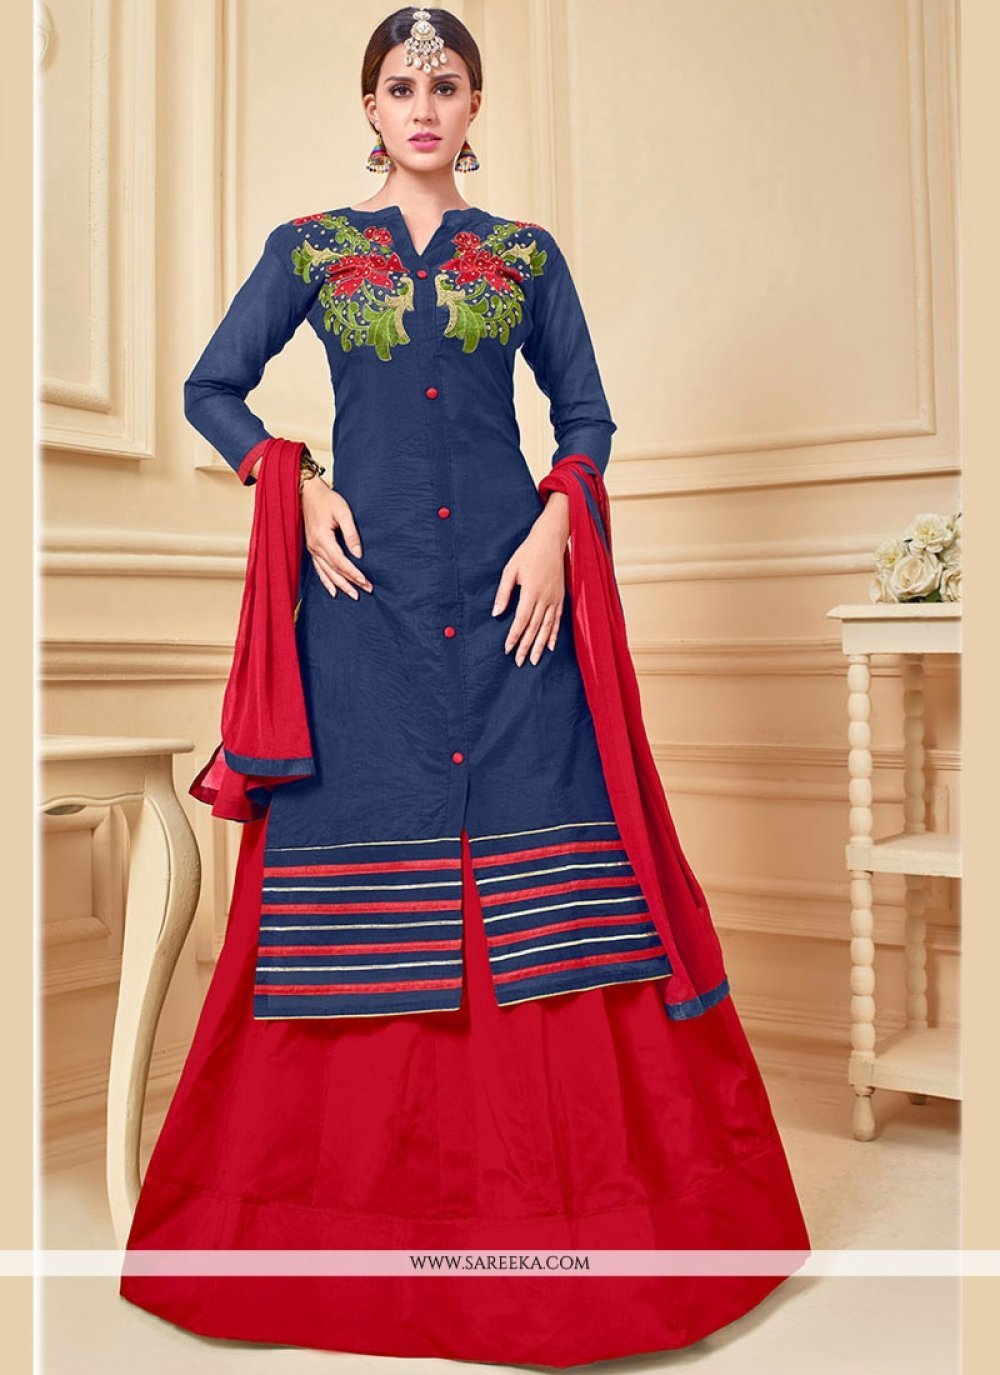 Chanderi Cotton Embroidered Work Long Choli Lehenga